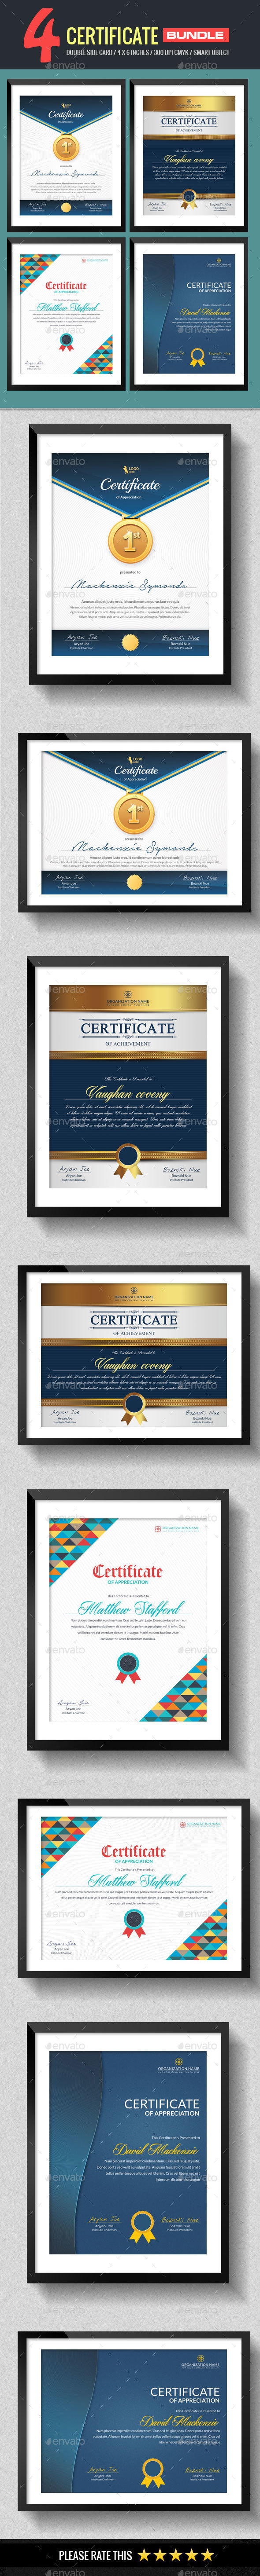 4 In 1 Multipurpose Certificates Bundle - Certificates Stationery